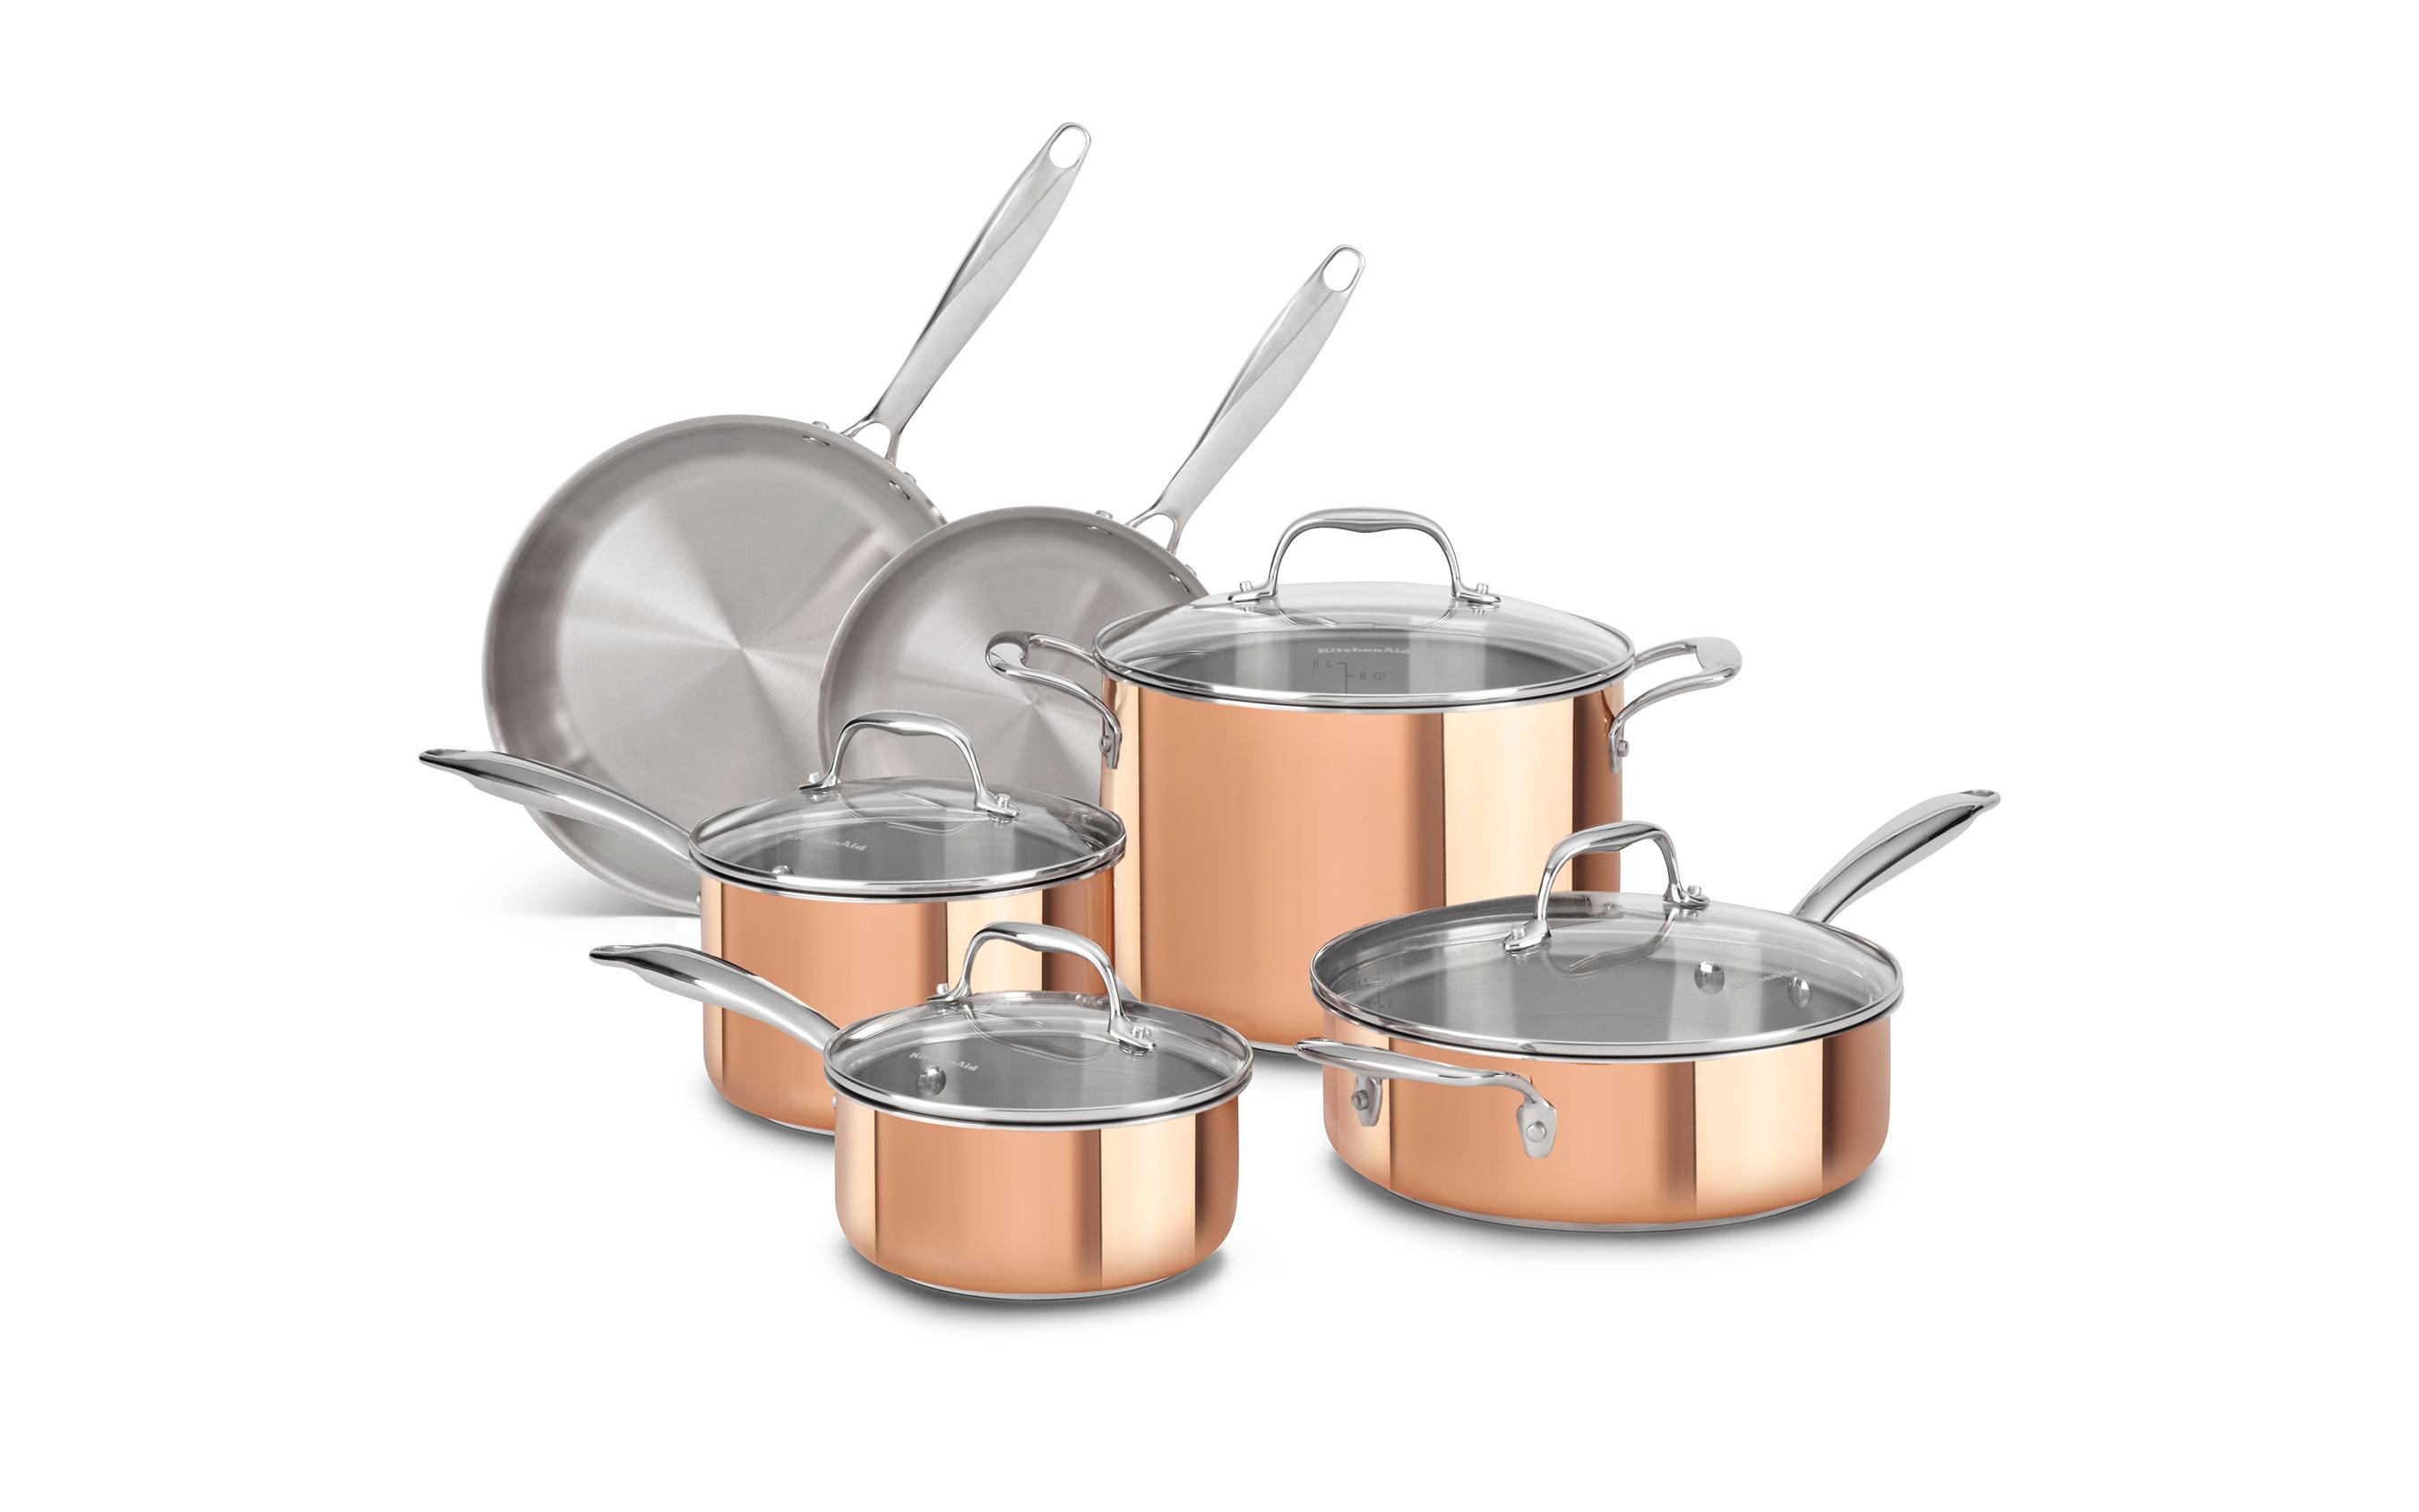 KitchenAid Tri-Ply Cookware